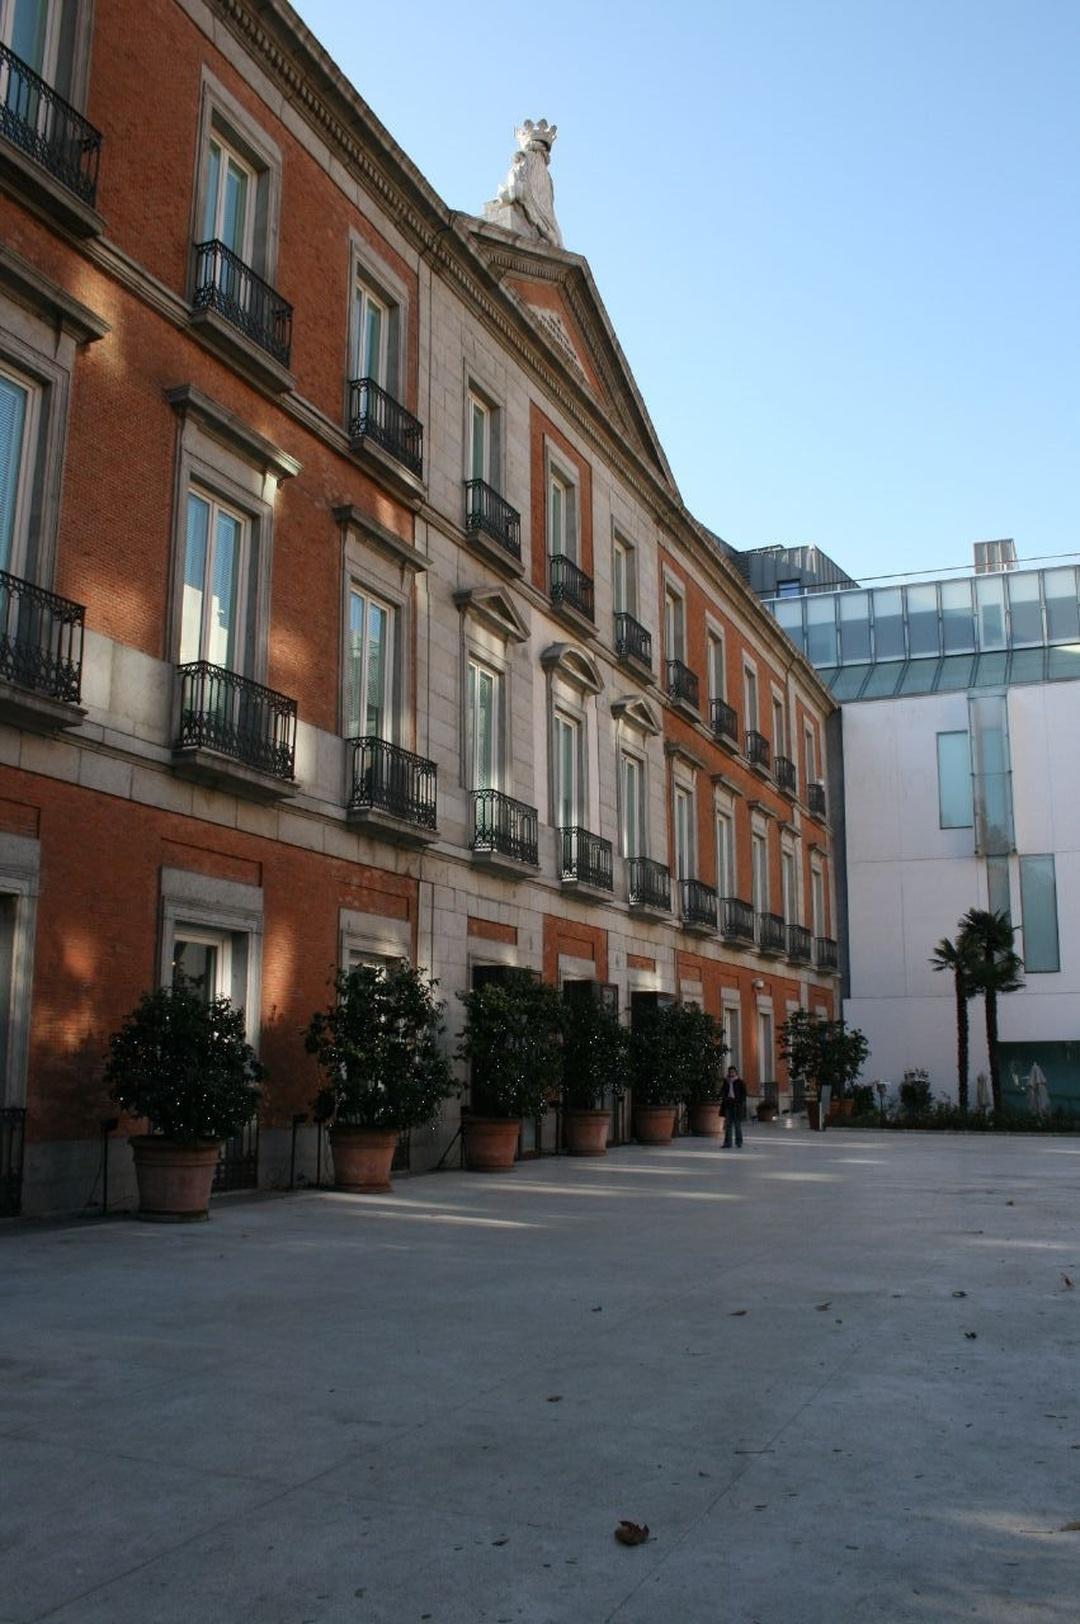 Photo of the February 5, 2016 6:50 PM, Thyssen-Bornemisza Museum, Paseo del Prado, 8, 28014 Madrid, Spain